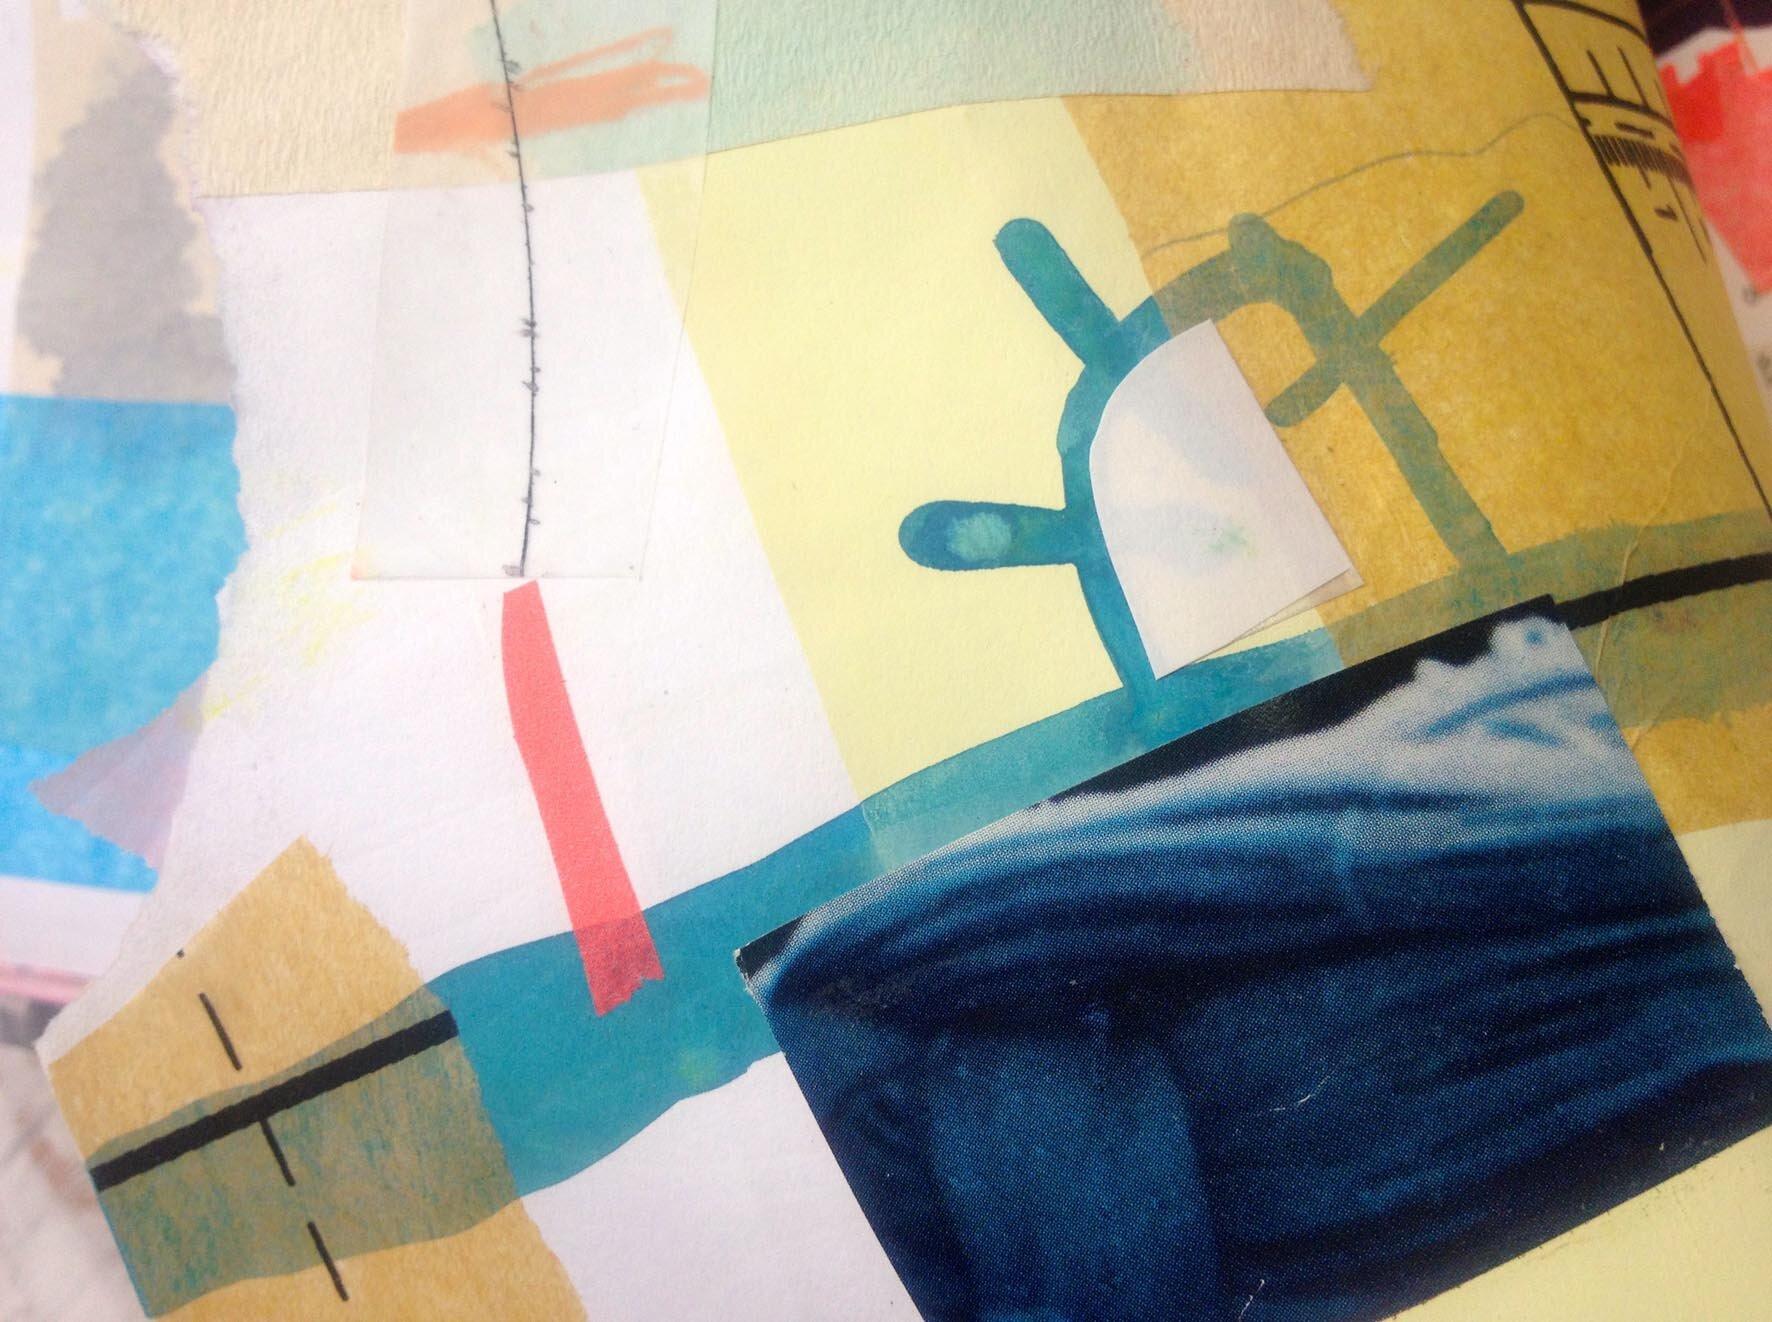 journalcollage#8sept2012highres.jpg